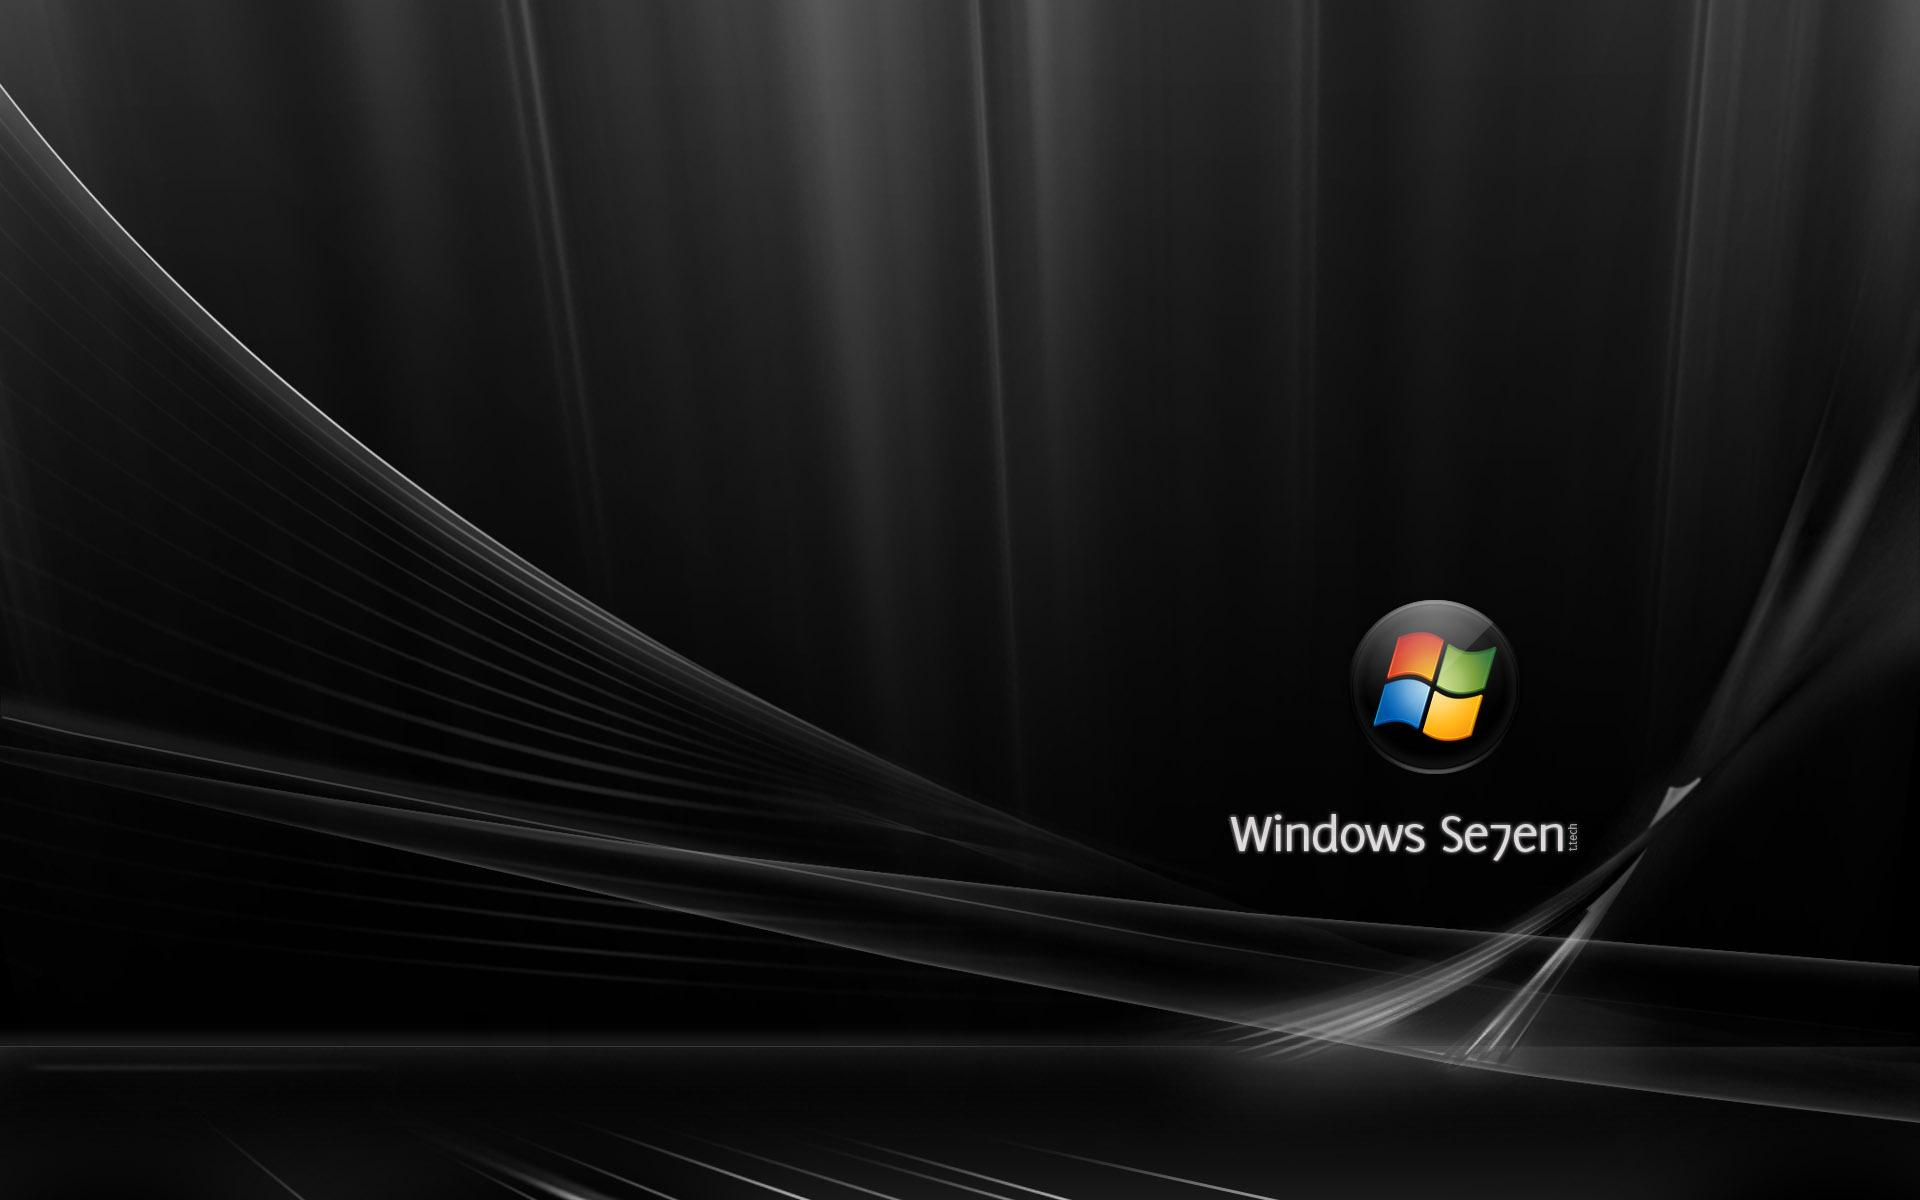 Windows 7 Hd 6775 Hd Wallpaper